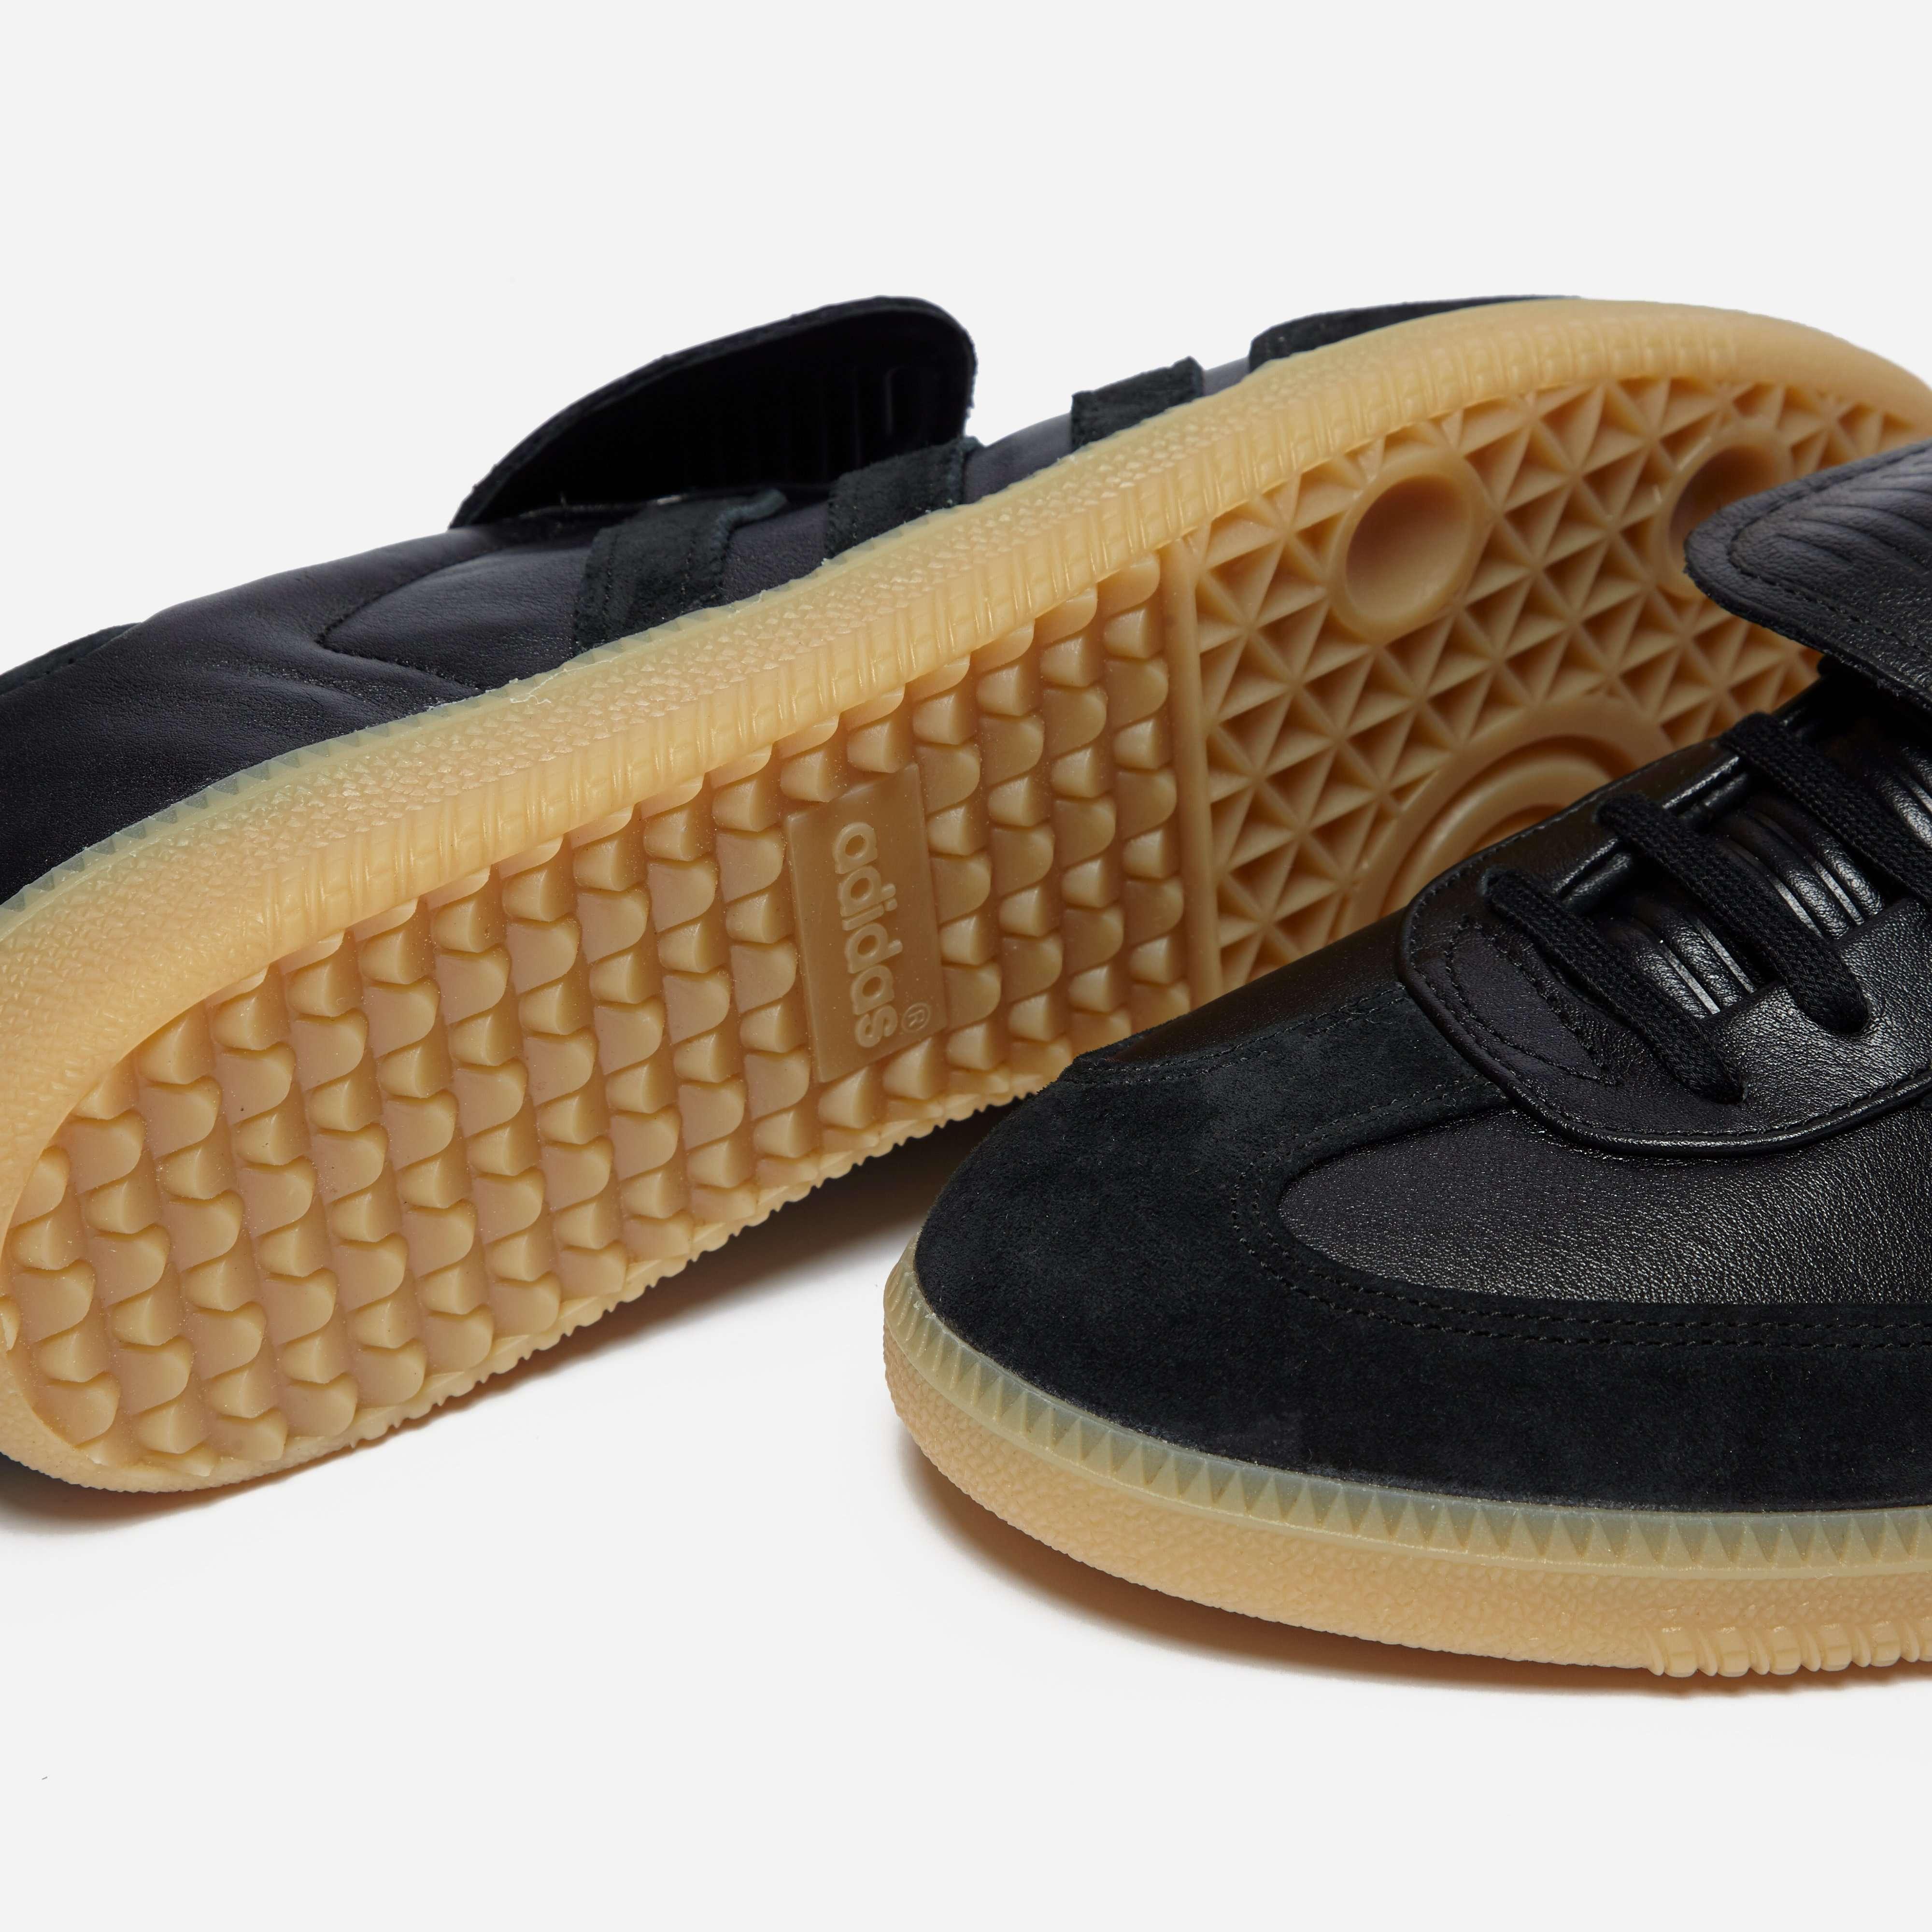 adidas Originals Samba Recon LT